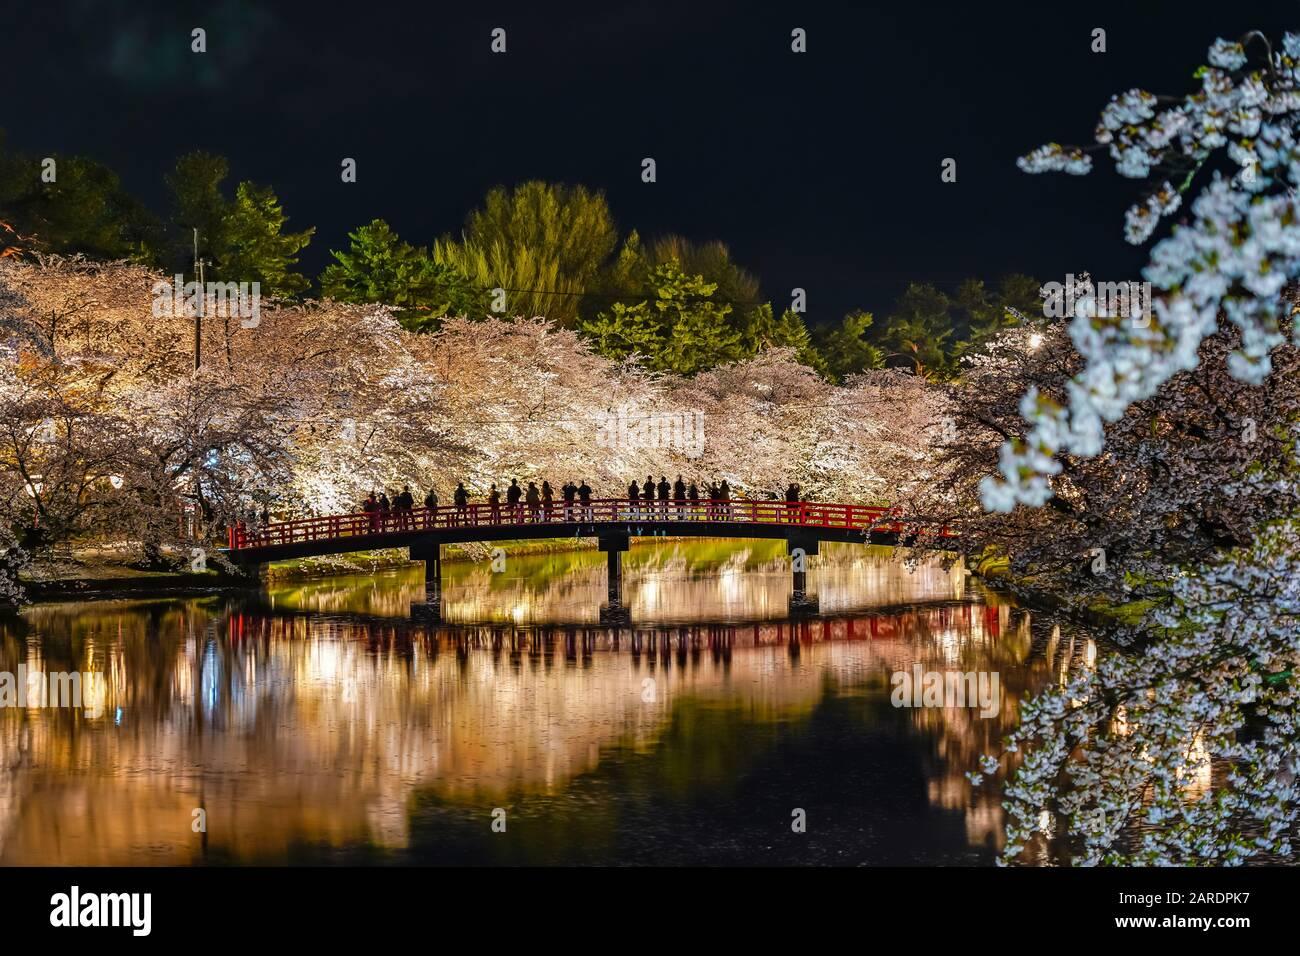 Hirosaki park cherry blossom matsuri festival light up at night. Beauty full bloom pink flowers in west moat Shunyo-bashi Bridge and lights illuminate Stock Photo